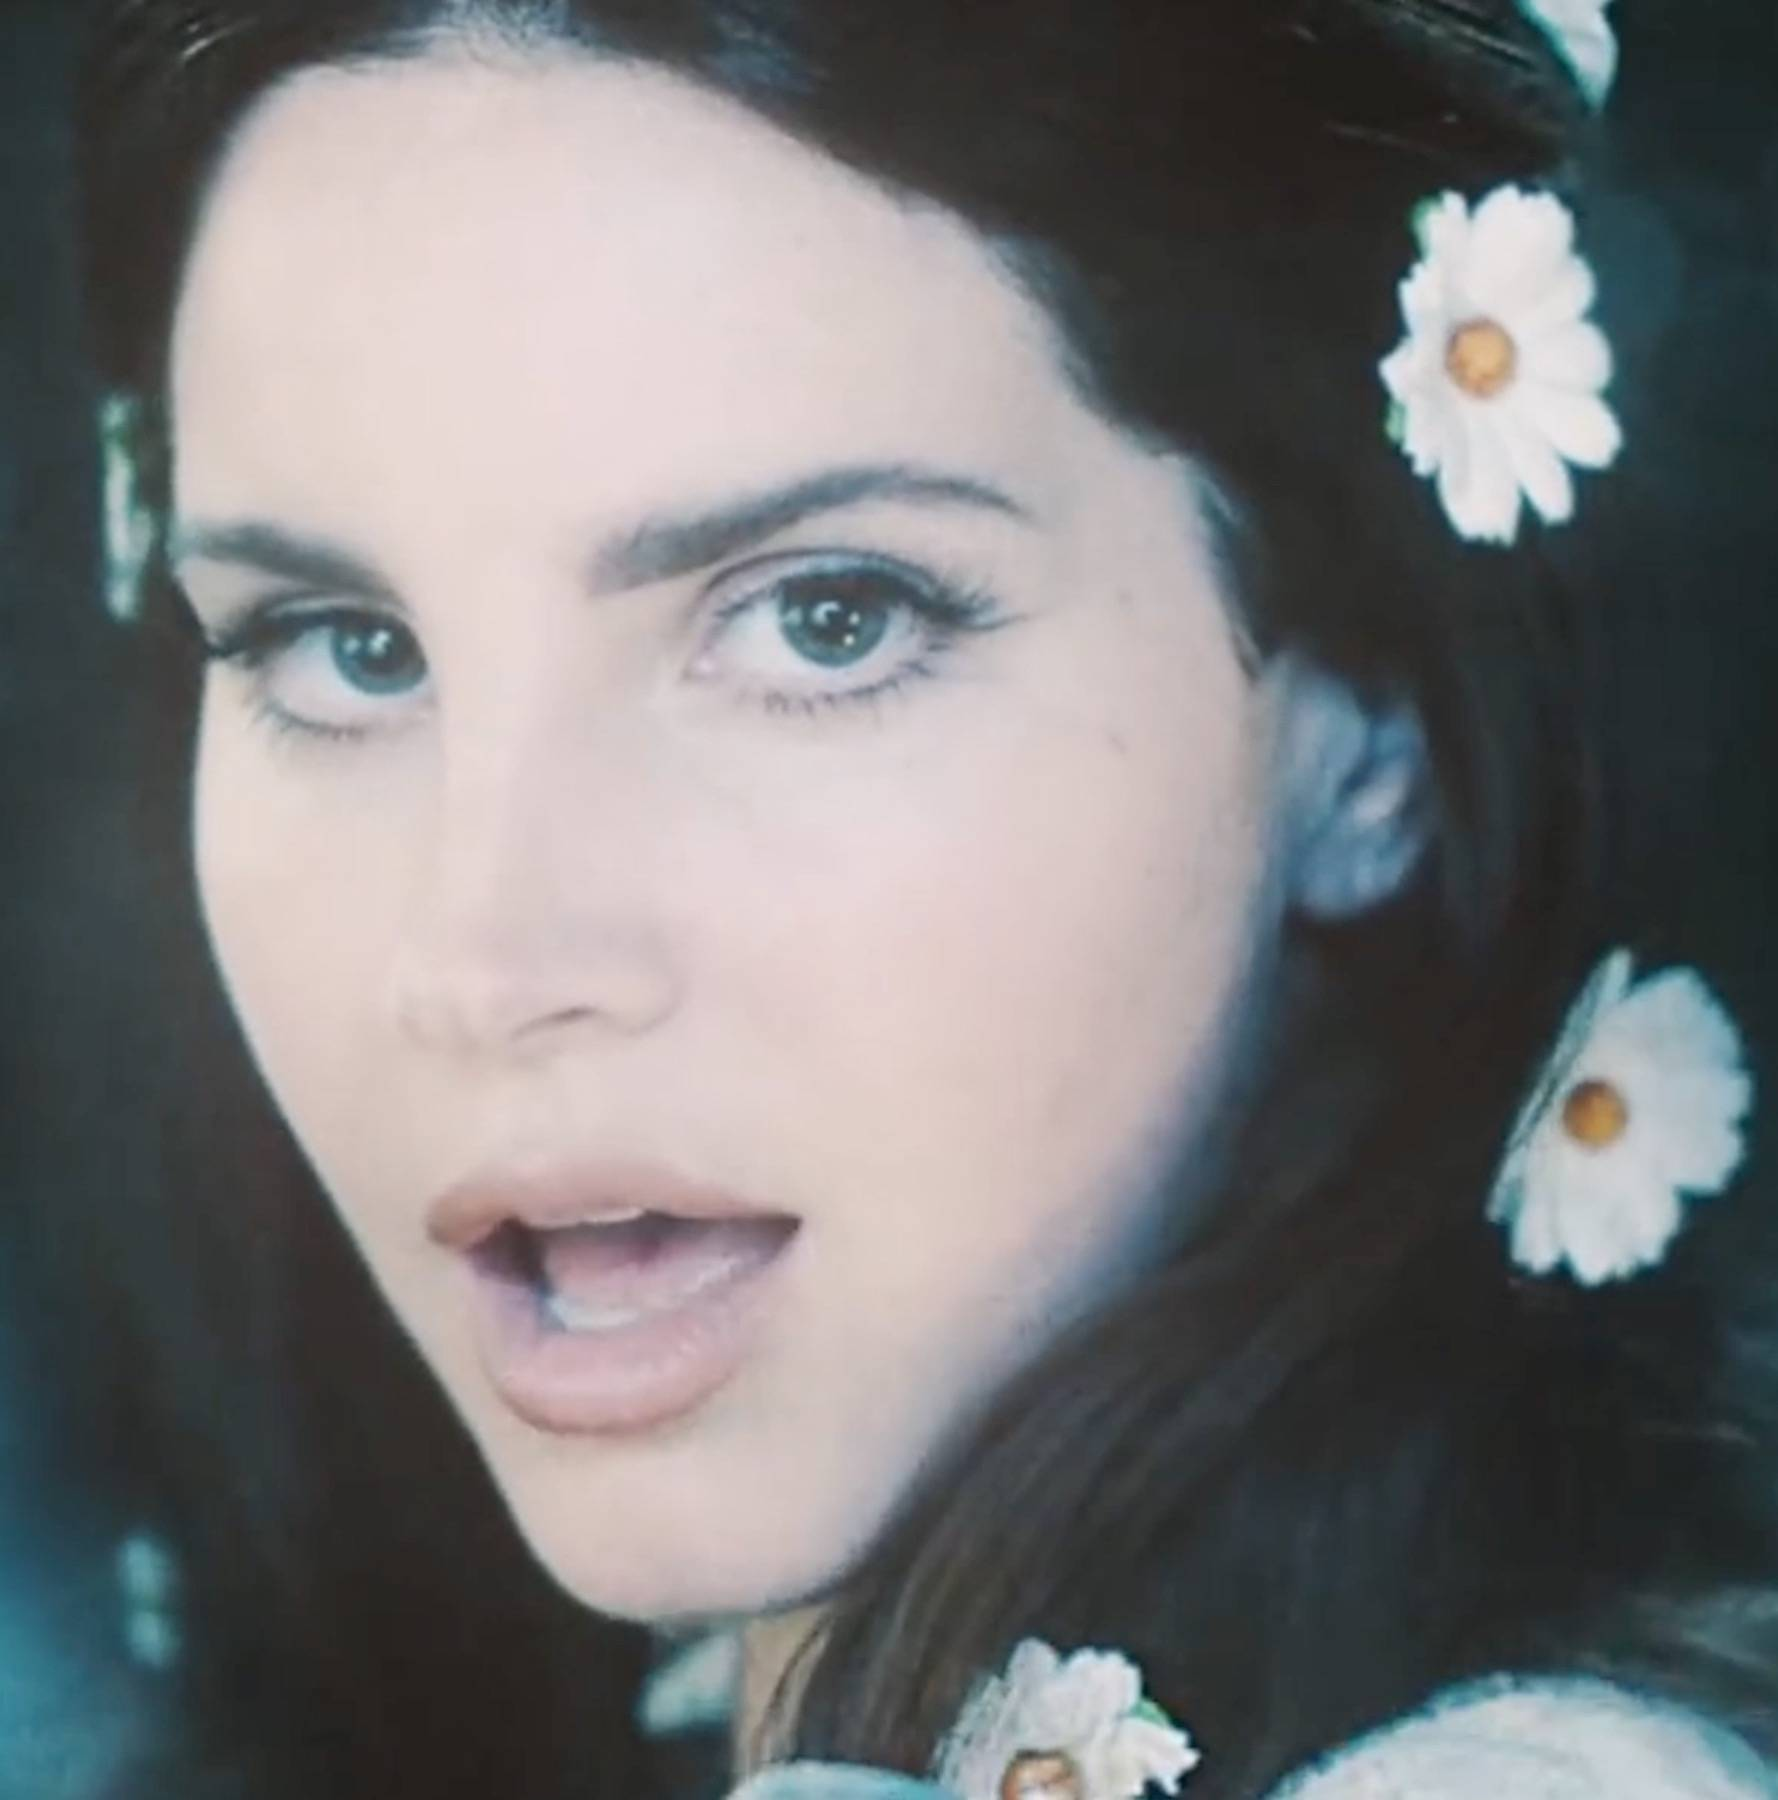 Happy birthday to our queen, Lana Del Rey